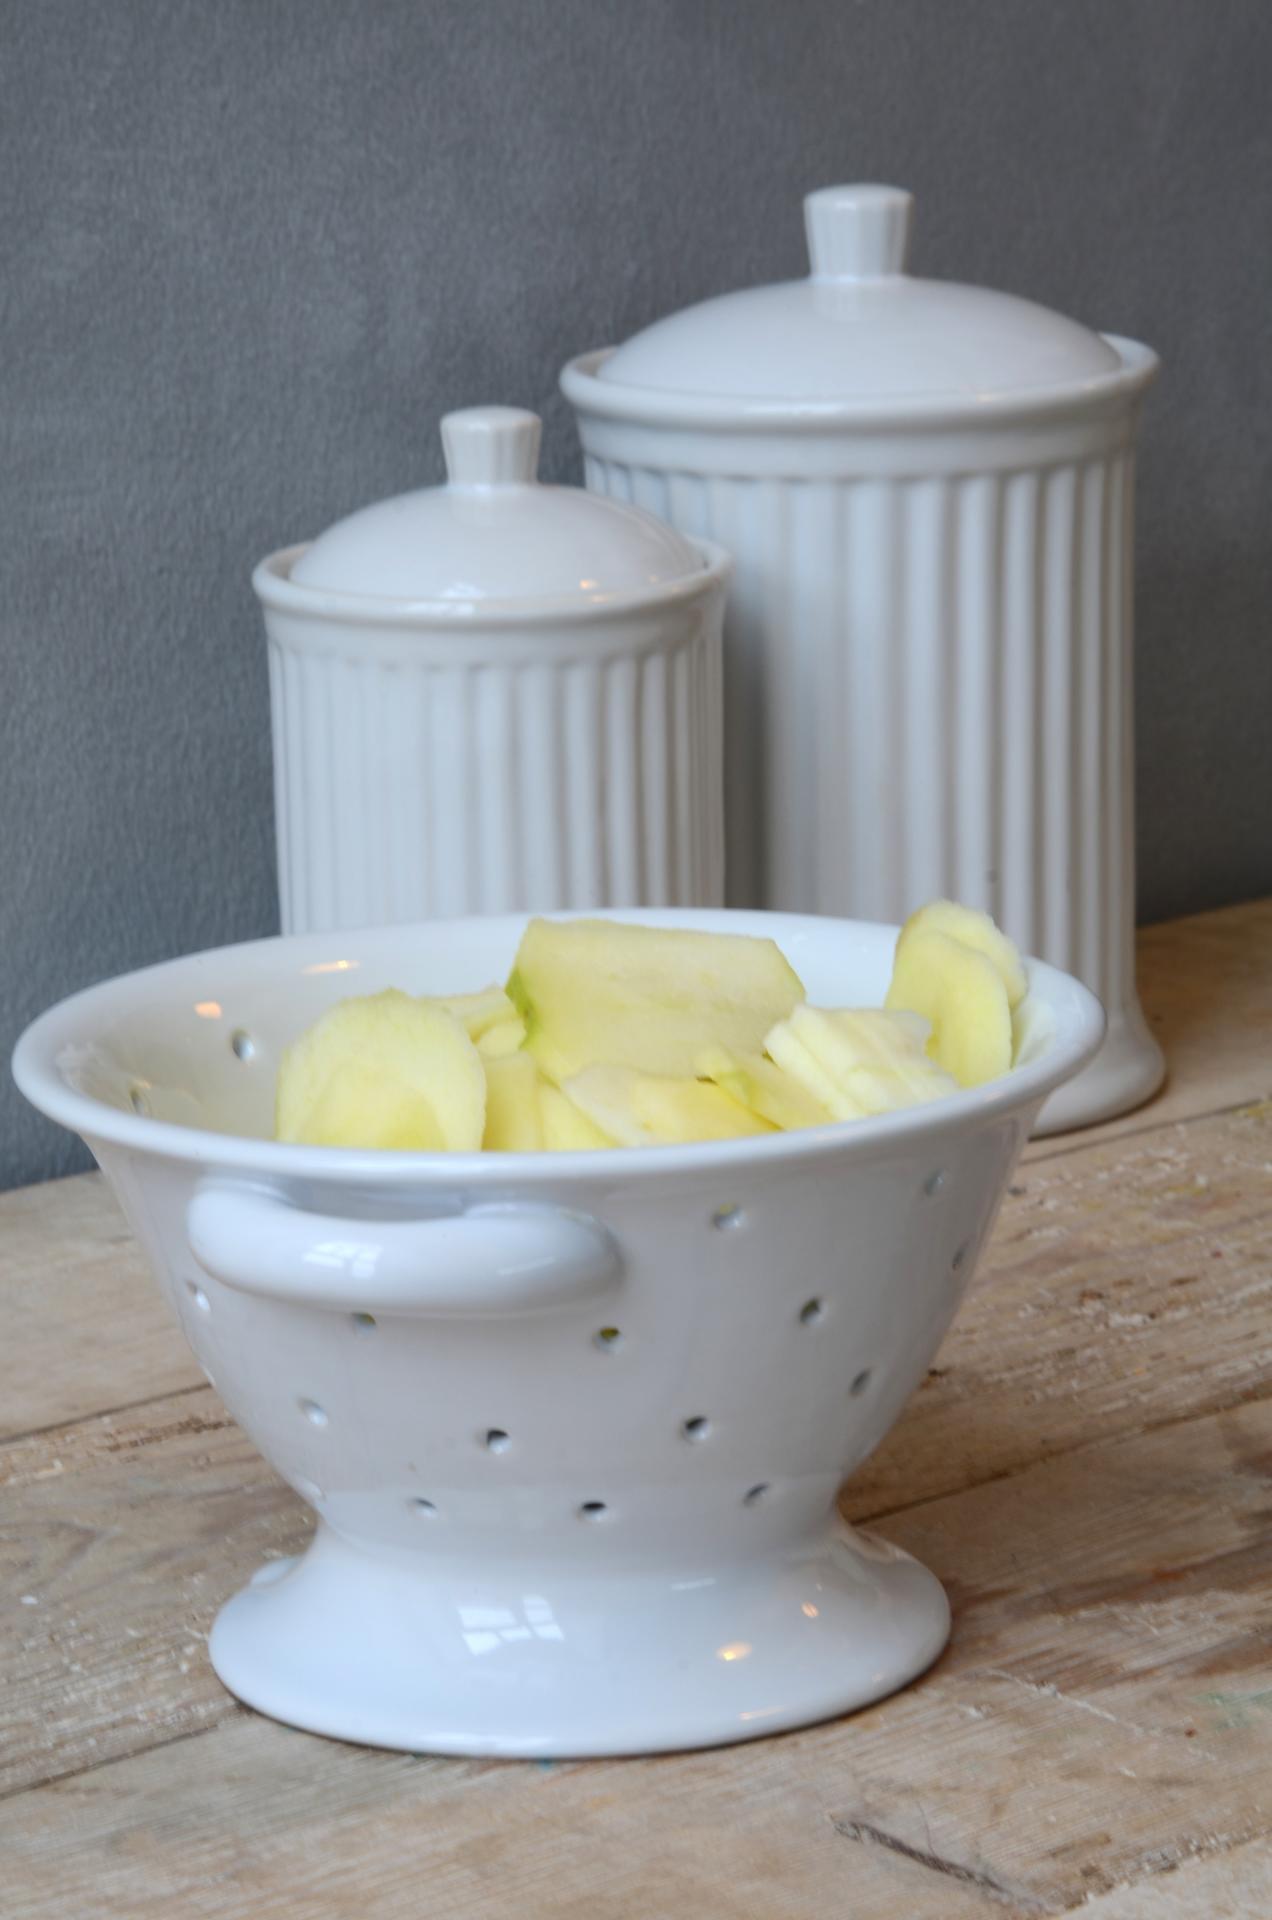 IB LAURSEN Keramický cedník Mynte white, bílá barva, keramika